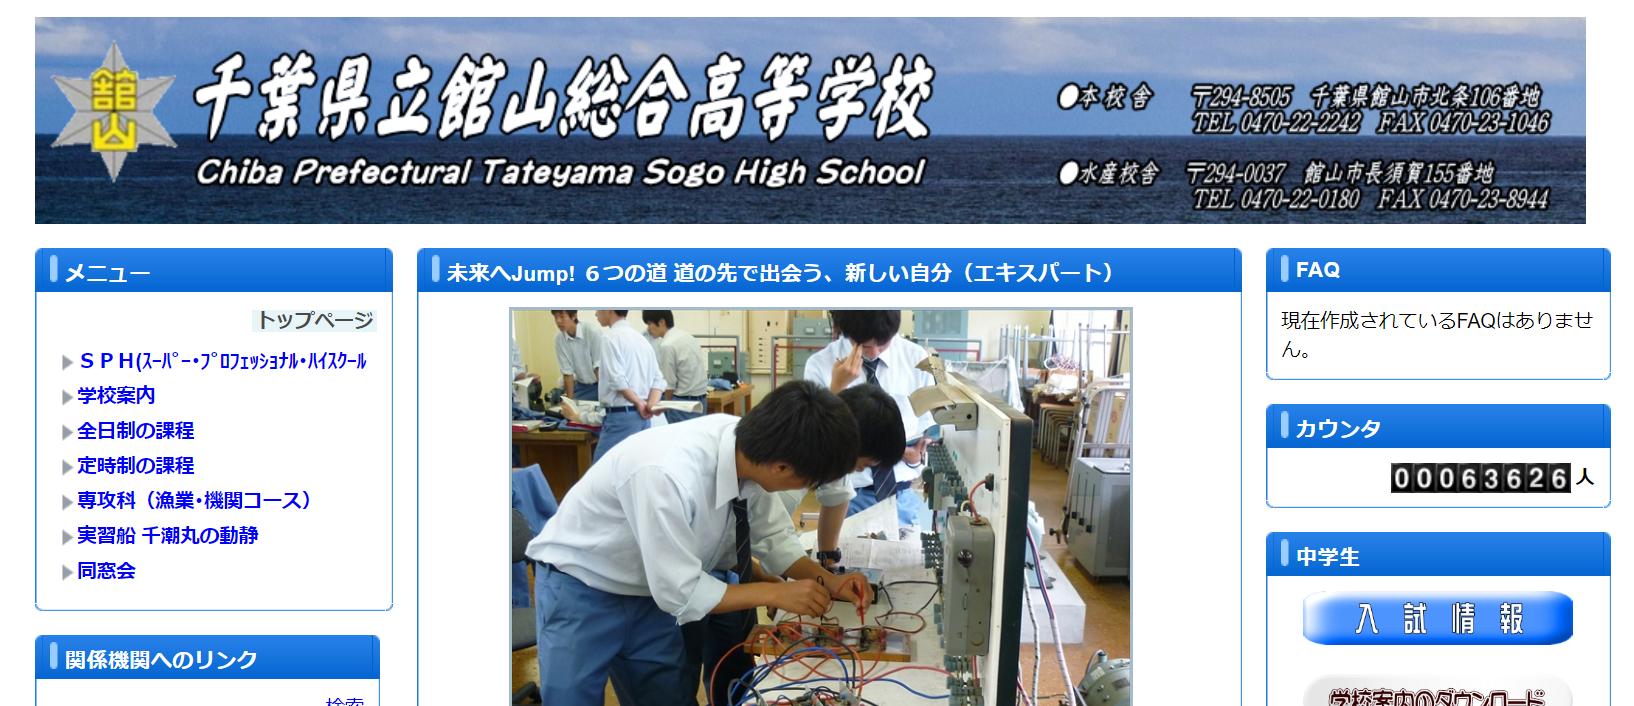 館山総合高校の口コミ・評判